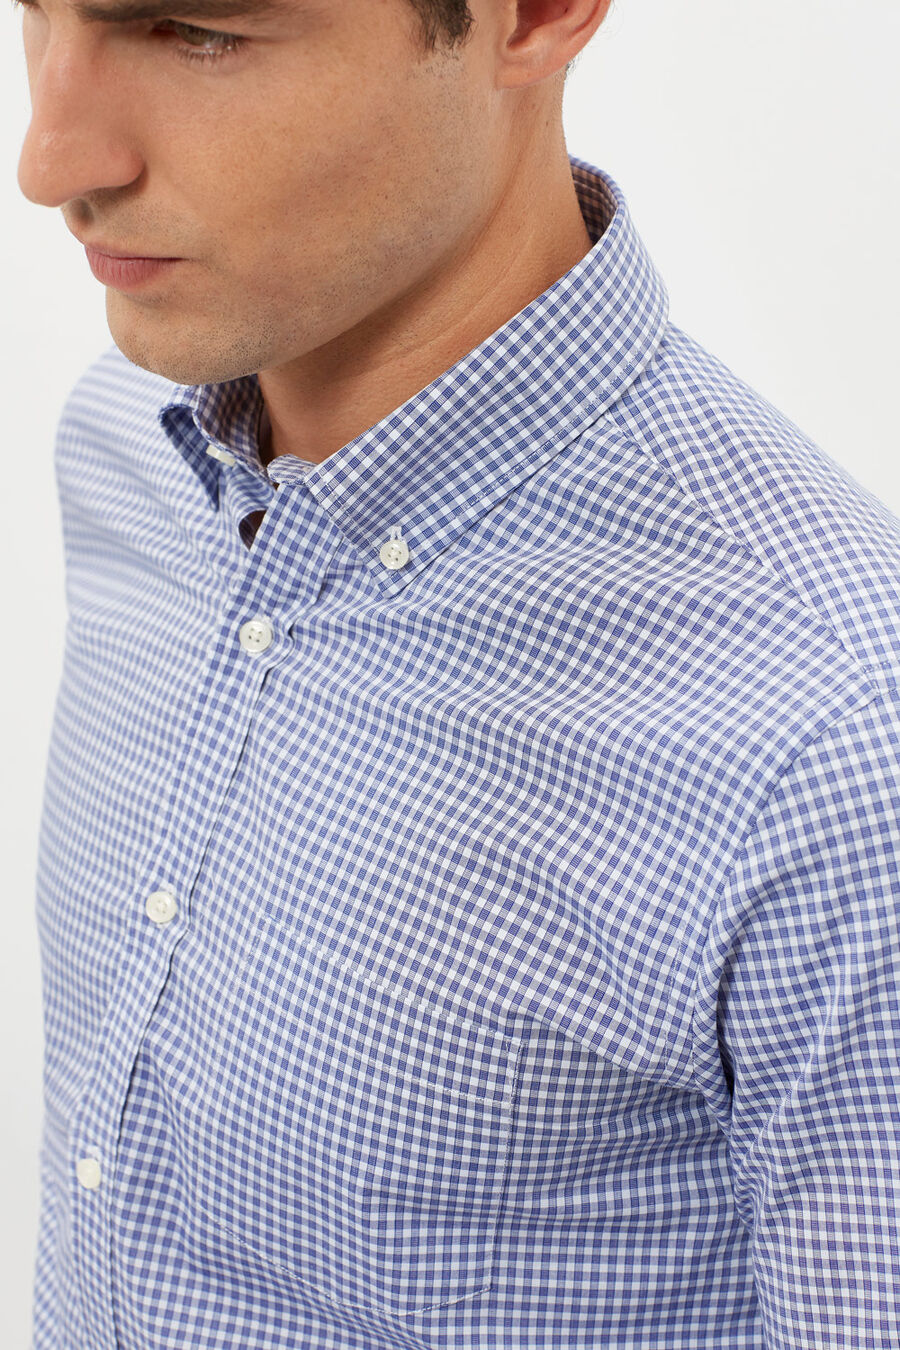 Gobi tailored fit shirt